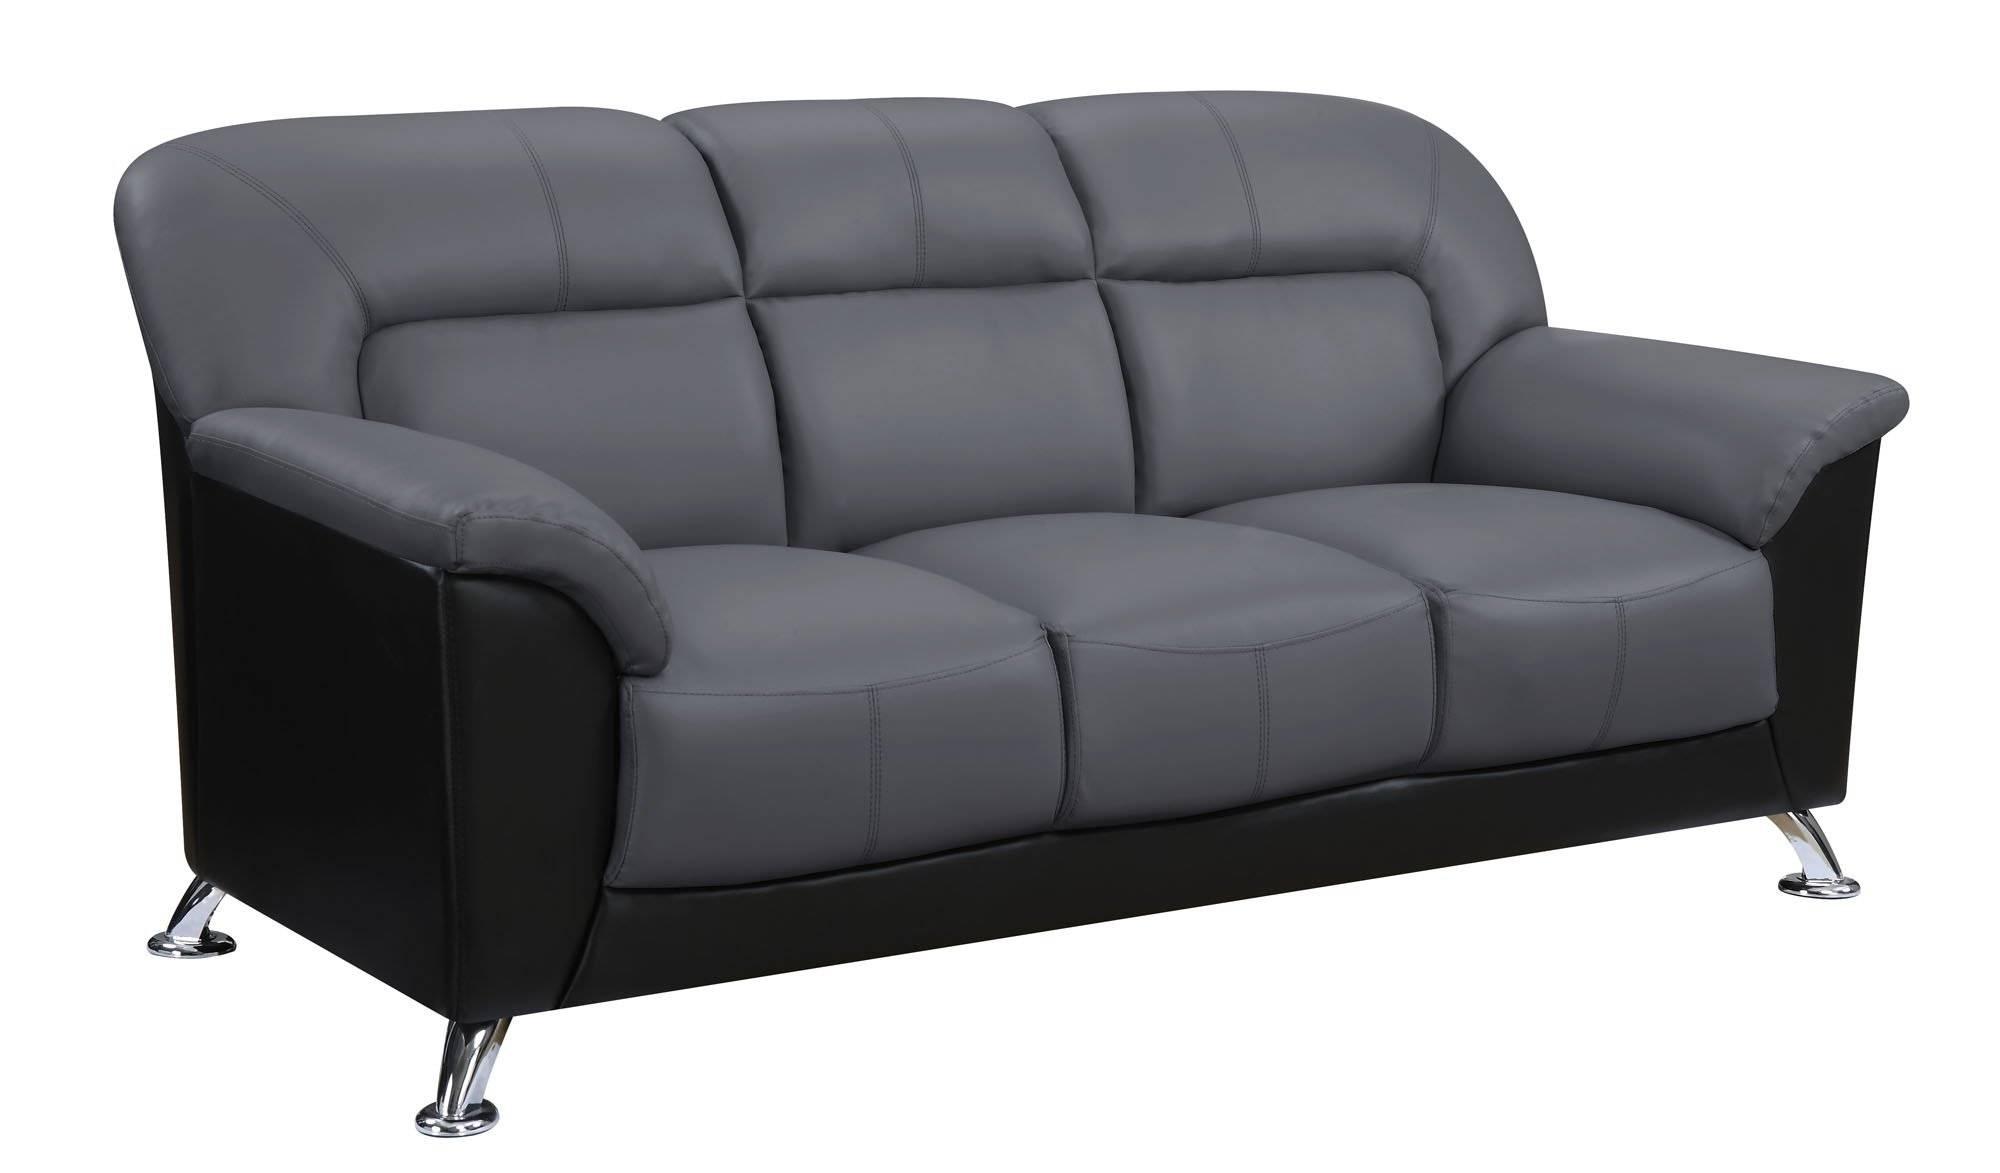 U9102 Dark Grey/black Vinyl Sofaglobal Furniture intended for Black Vinyl Sofas (Image 13 of 15)